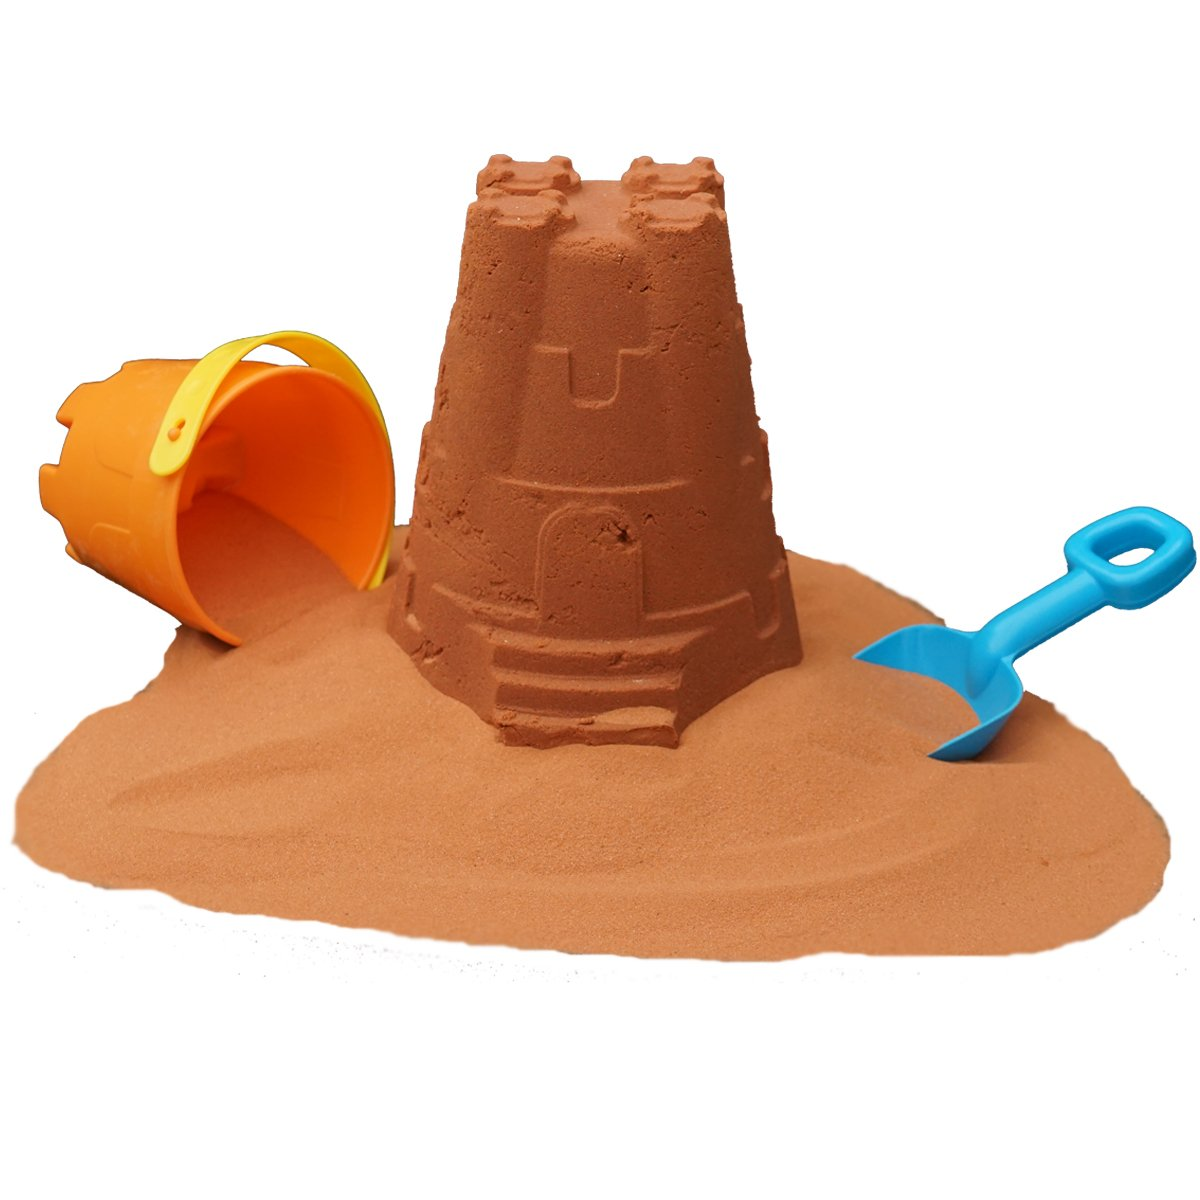 Original Jurassic Play Sand - 50 Pound Sandbox Sand